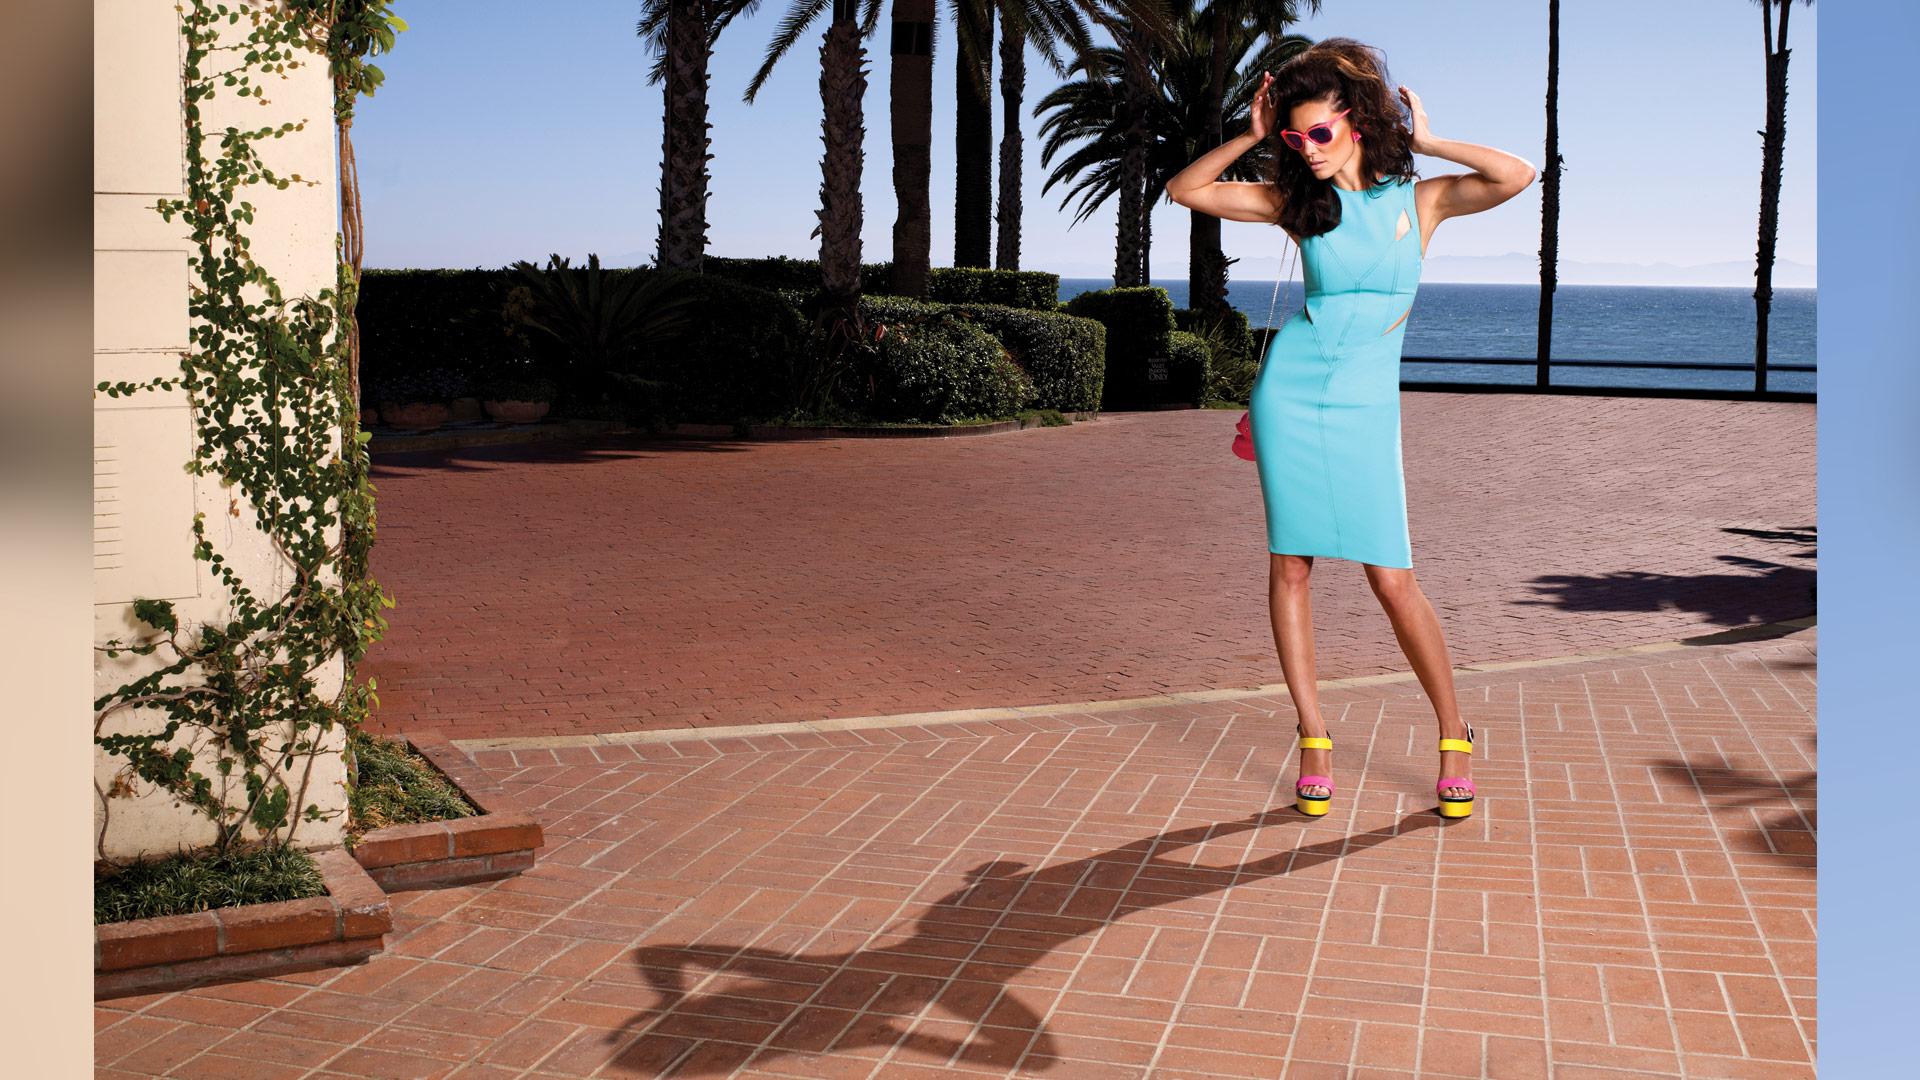 Daniela Ruah is fun and fabulous